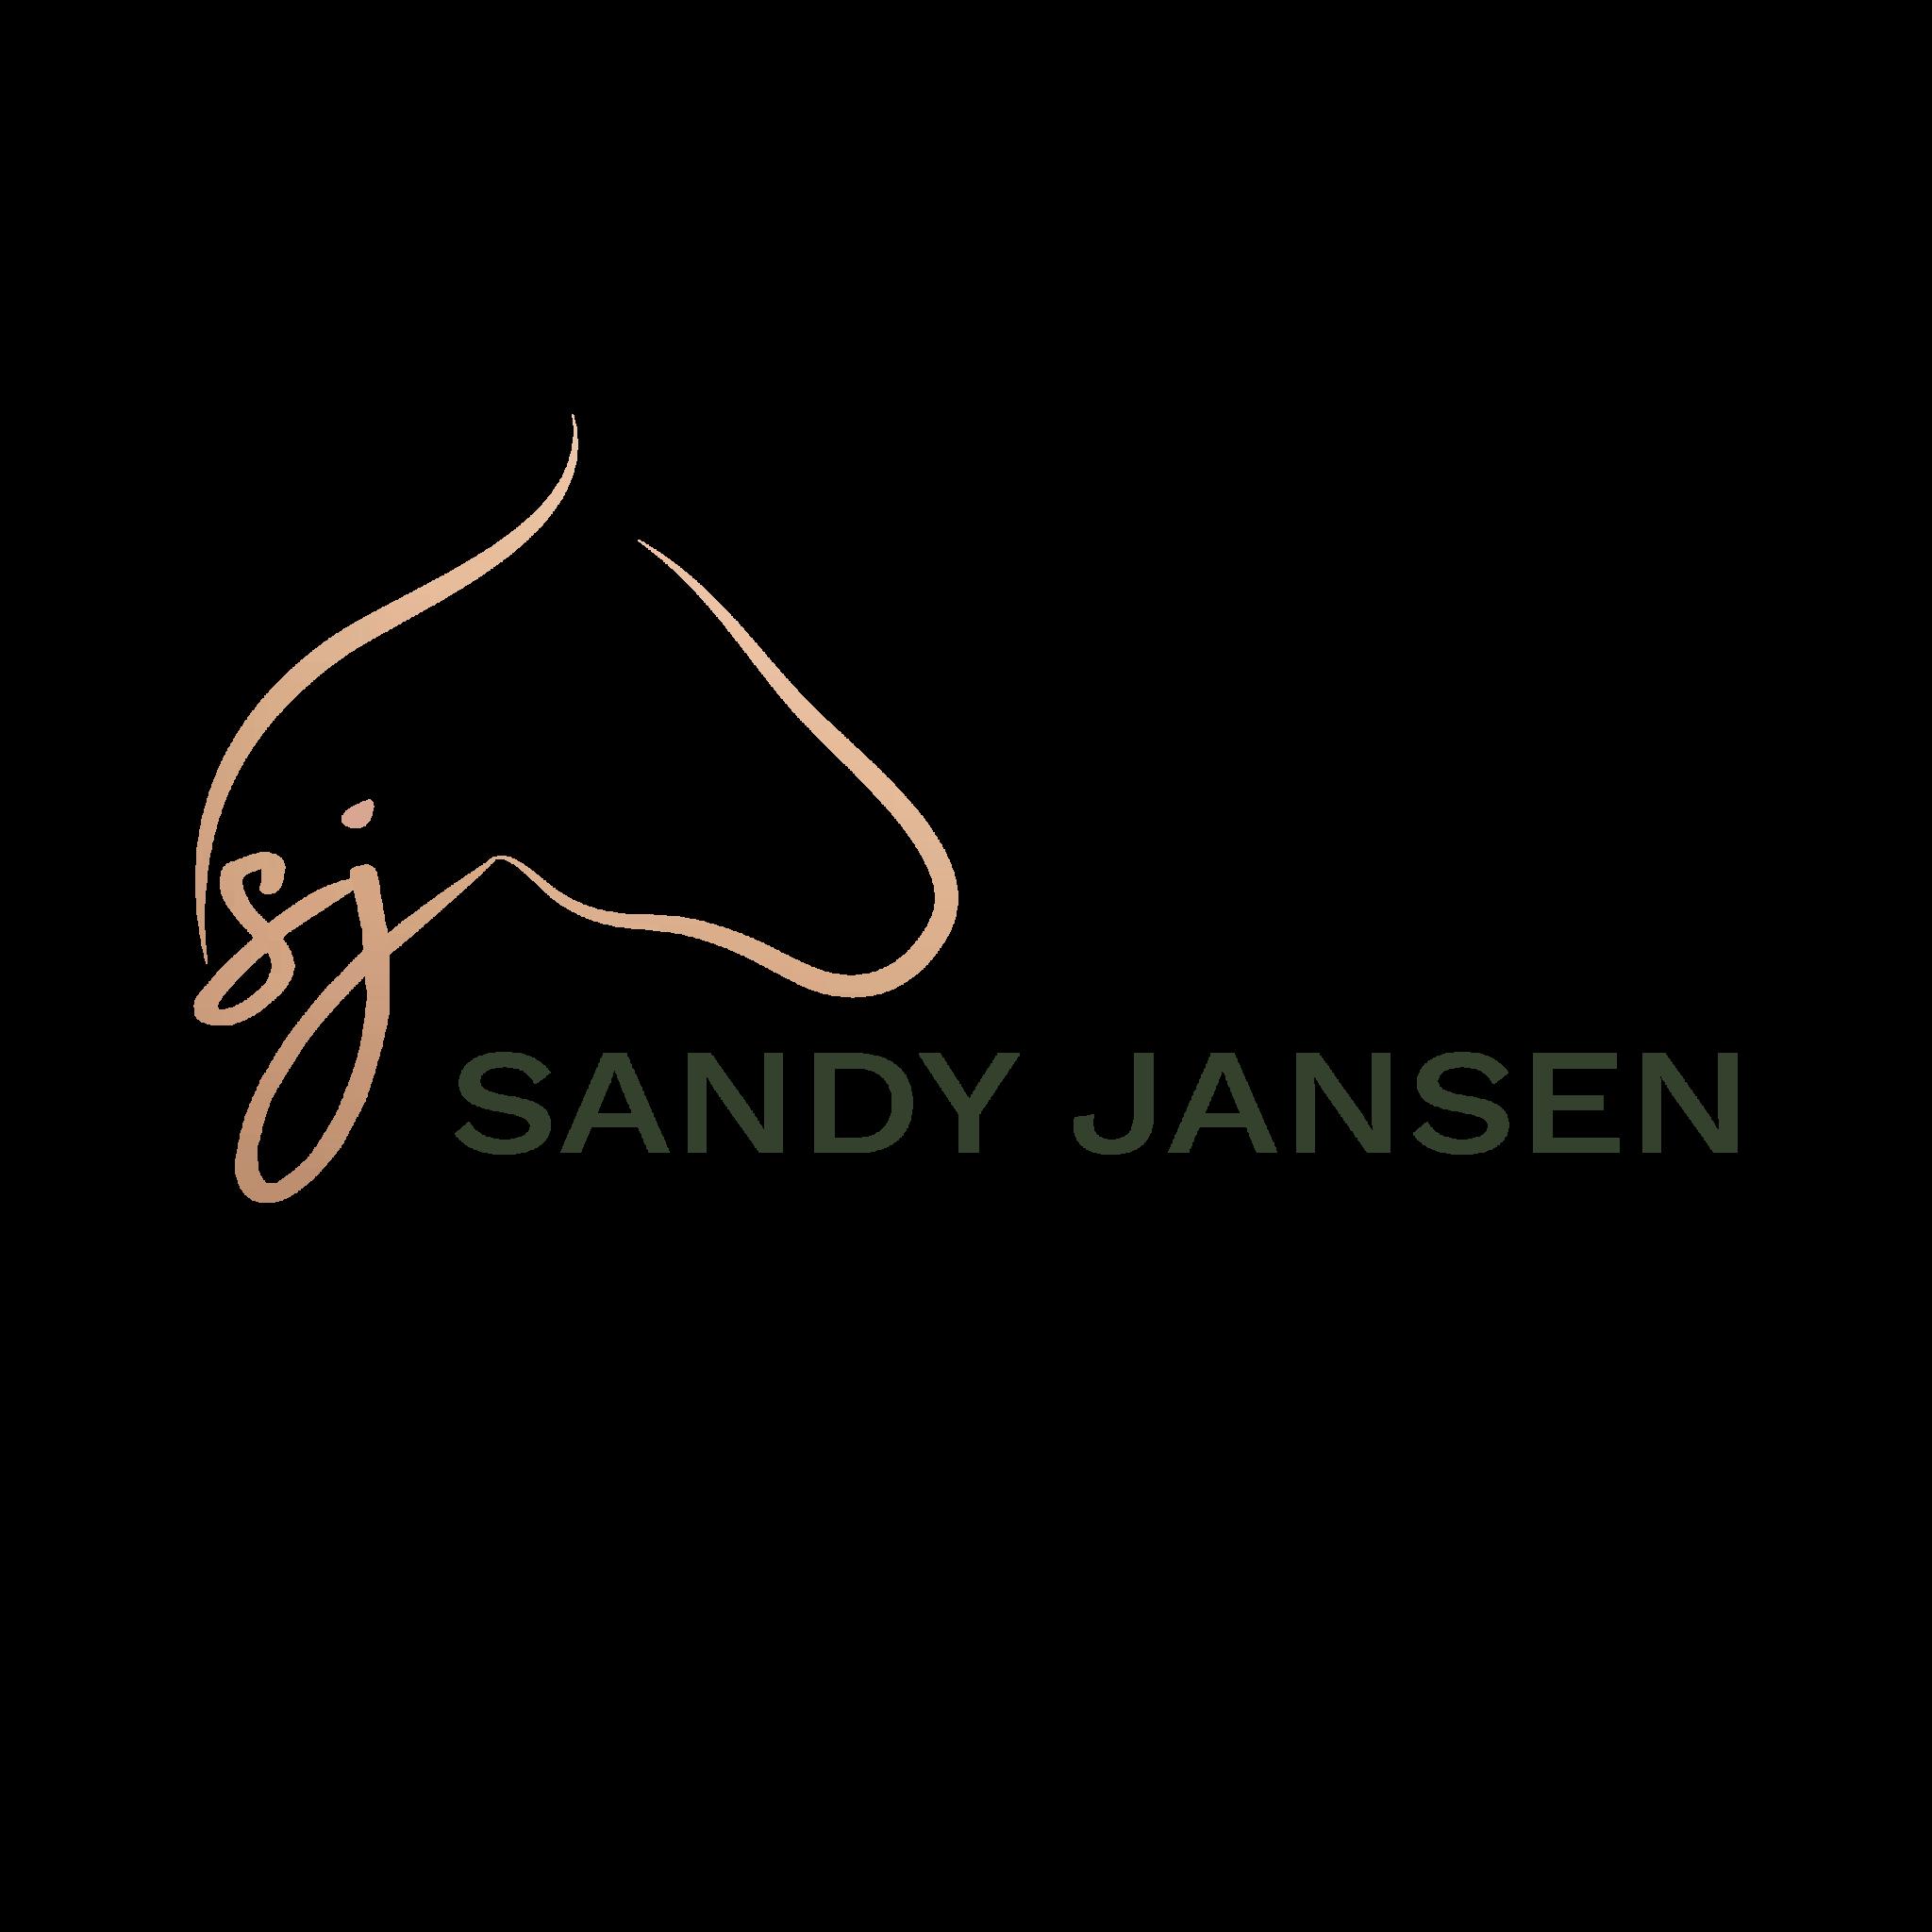 Sandy Jansen